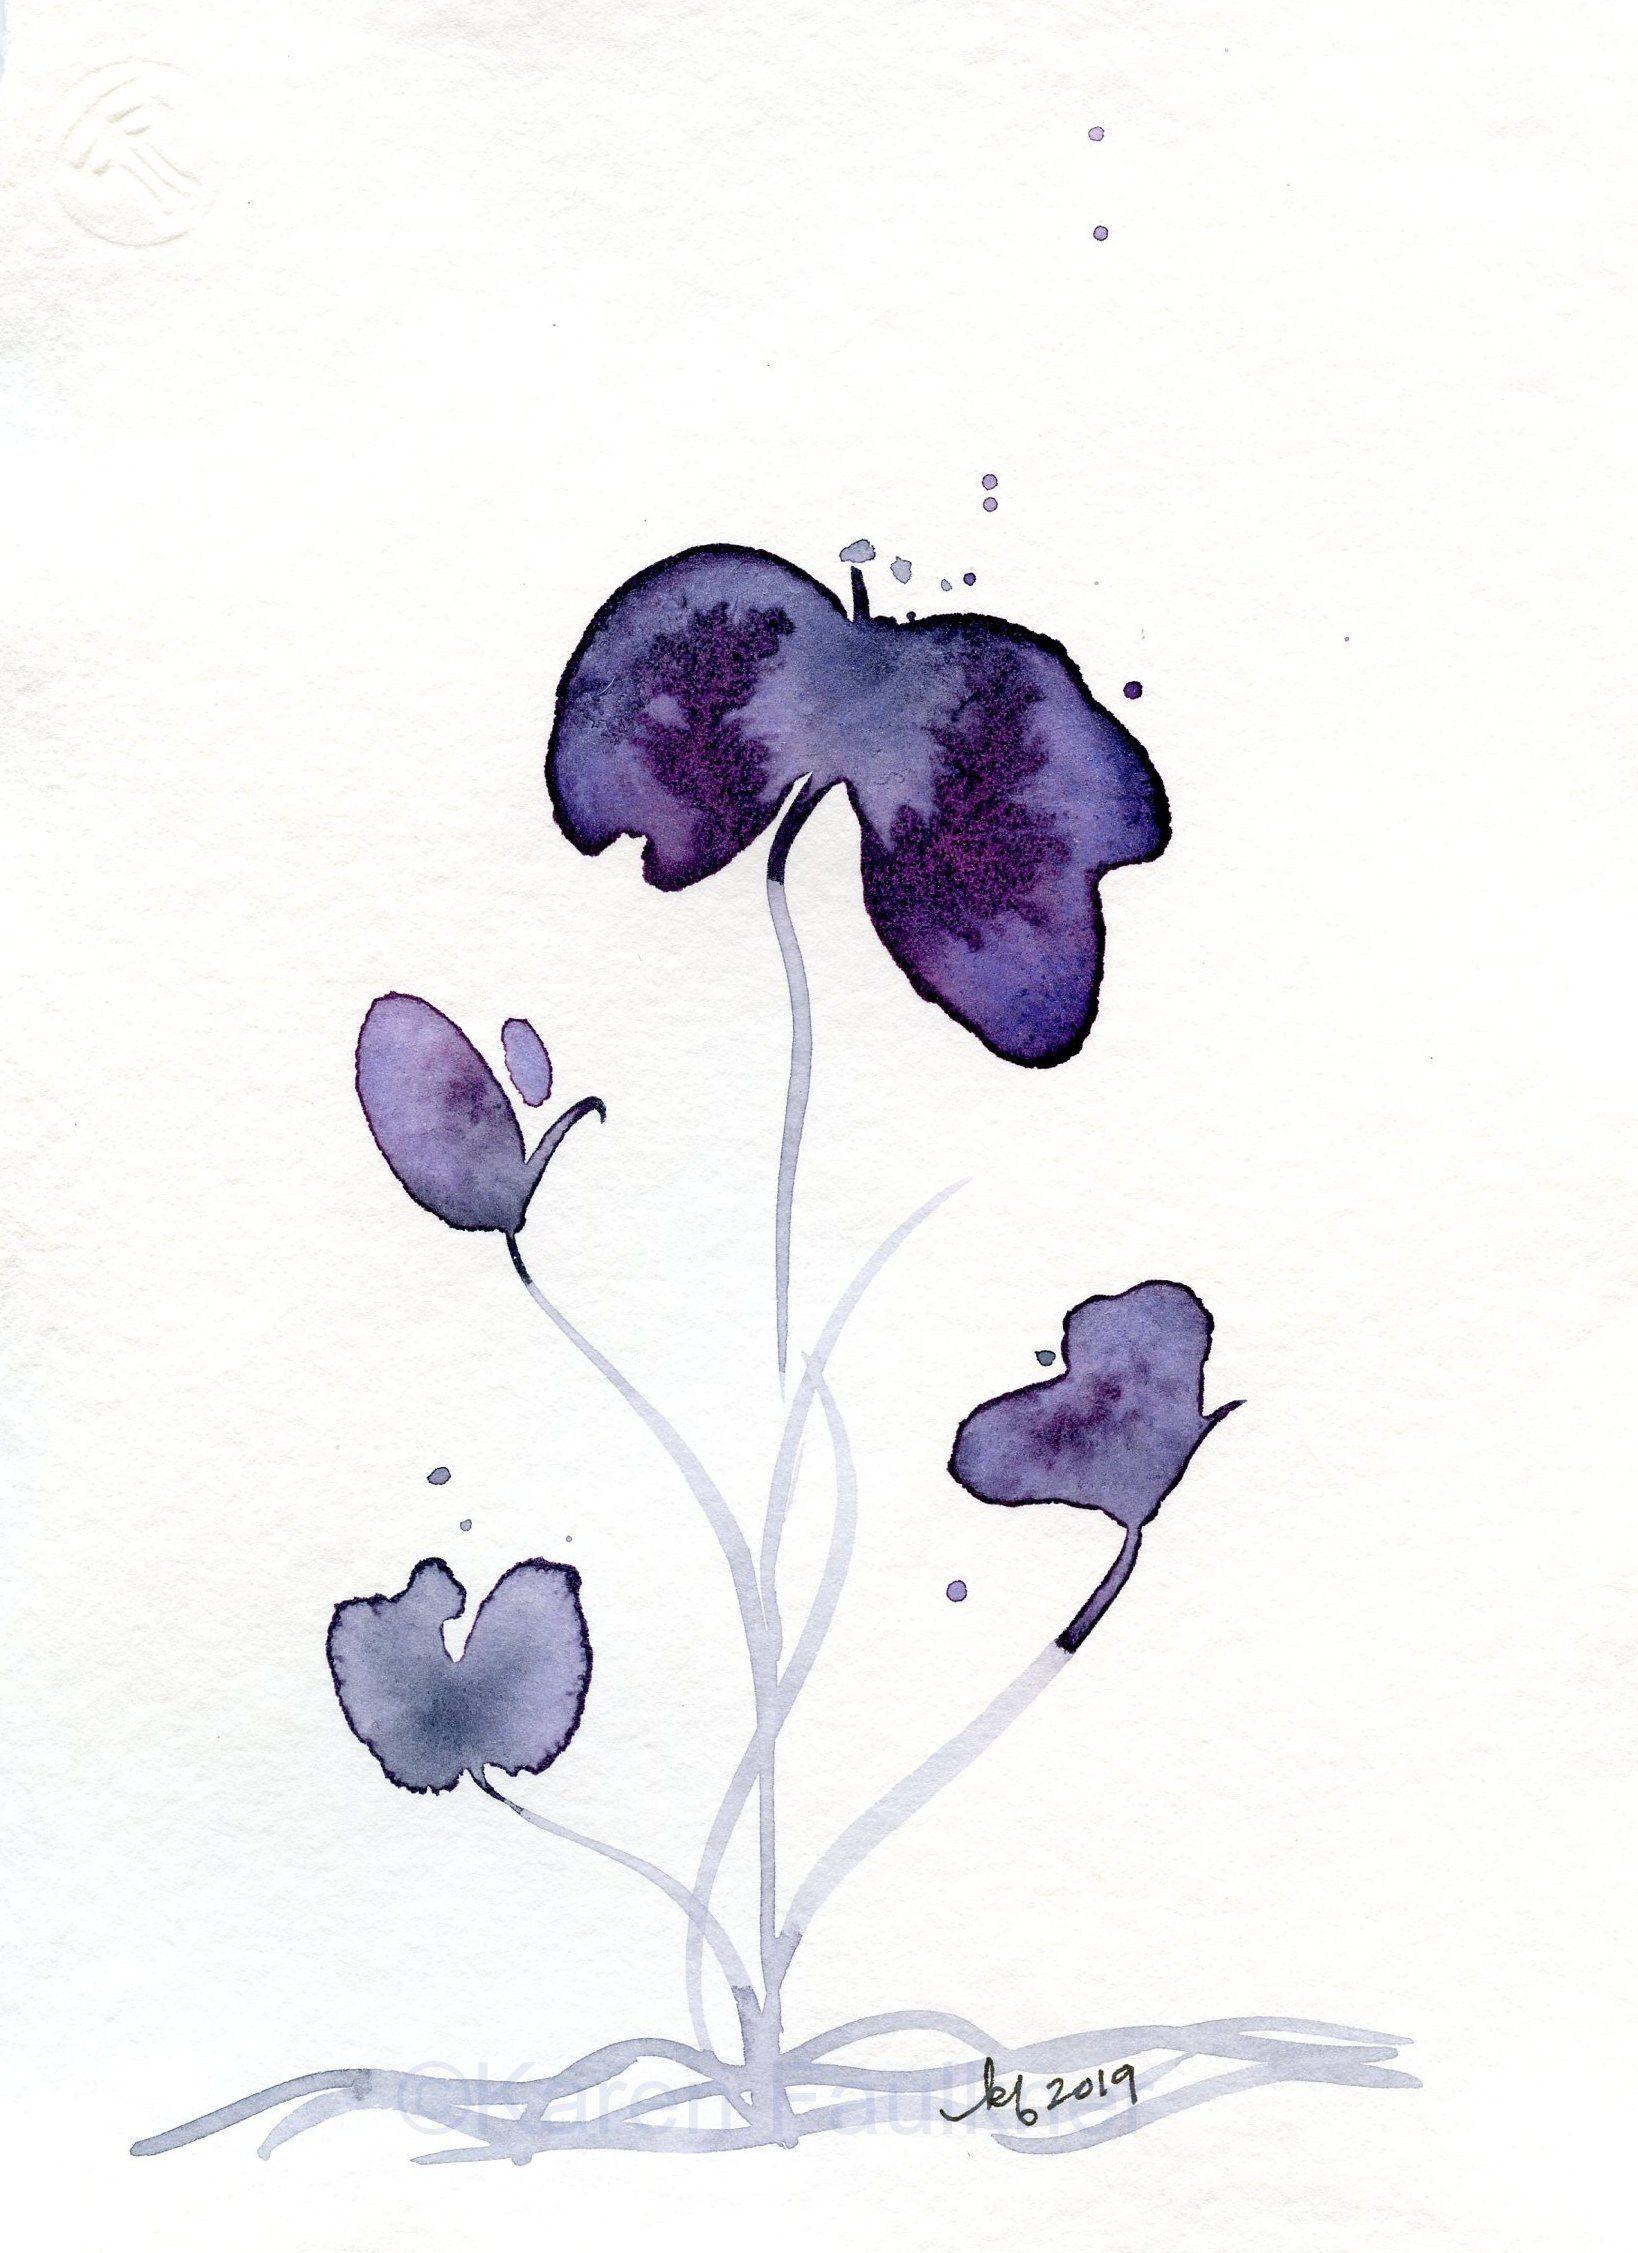 Original Watercolor Flower Painting Indigo Violet 3 By Karenfaulknerstudio On Etsy Malvorlagen Blumen Aquarell Malen Aquarell